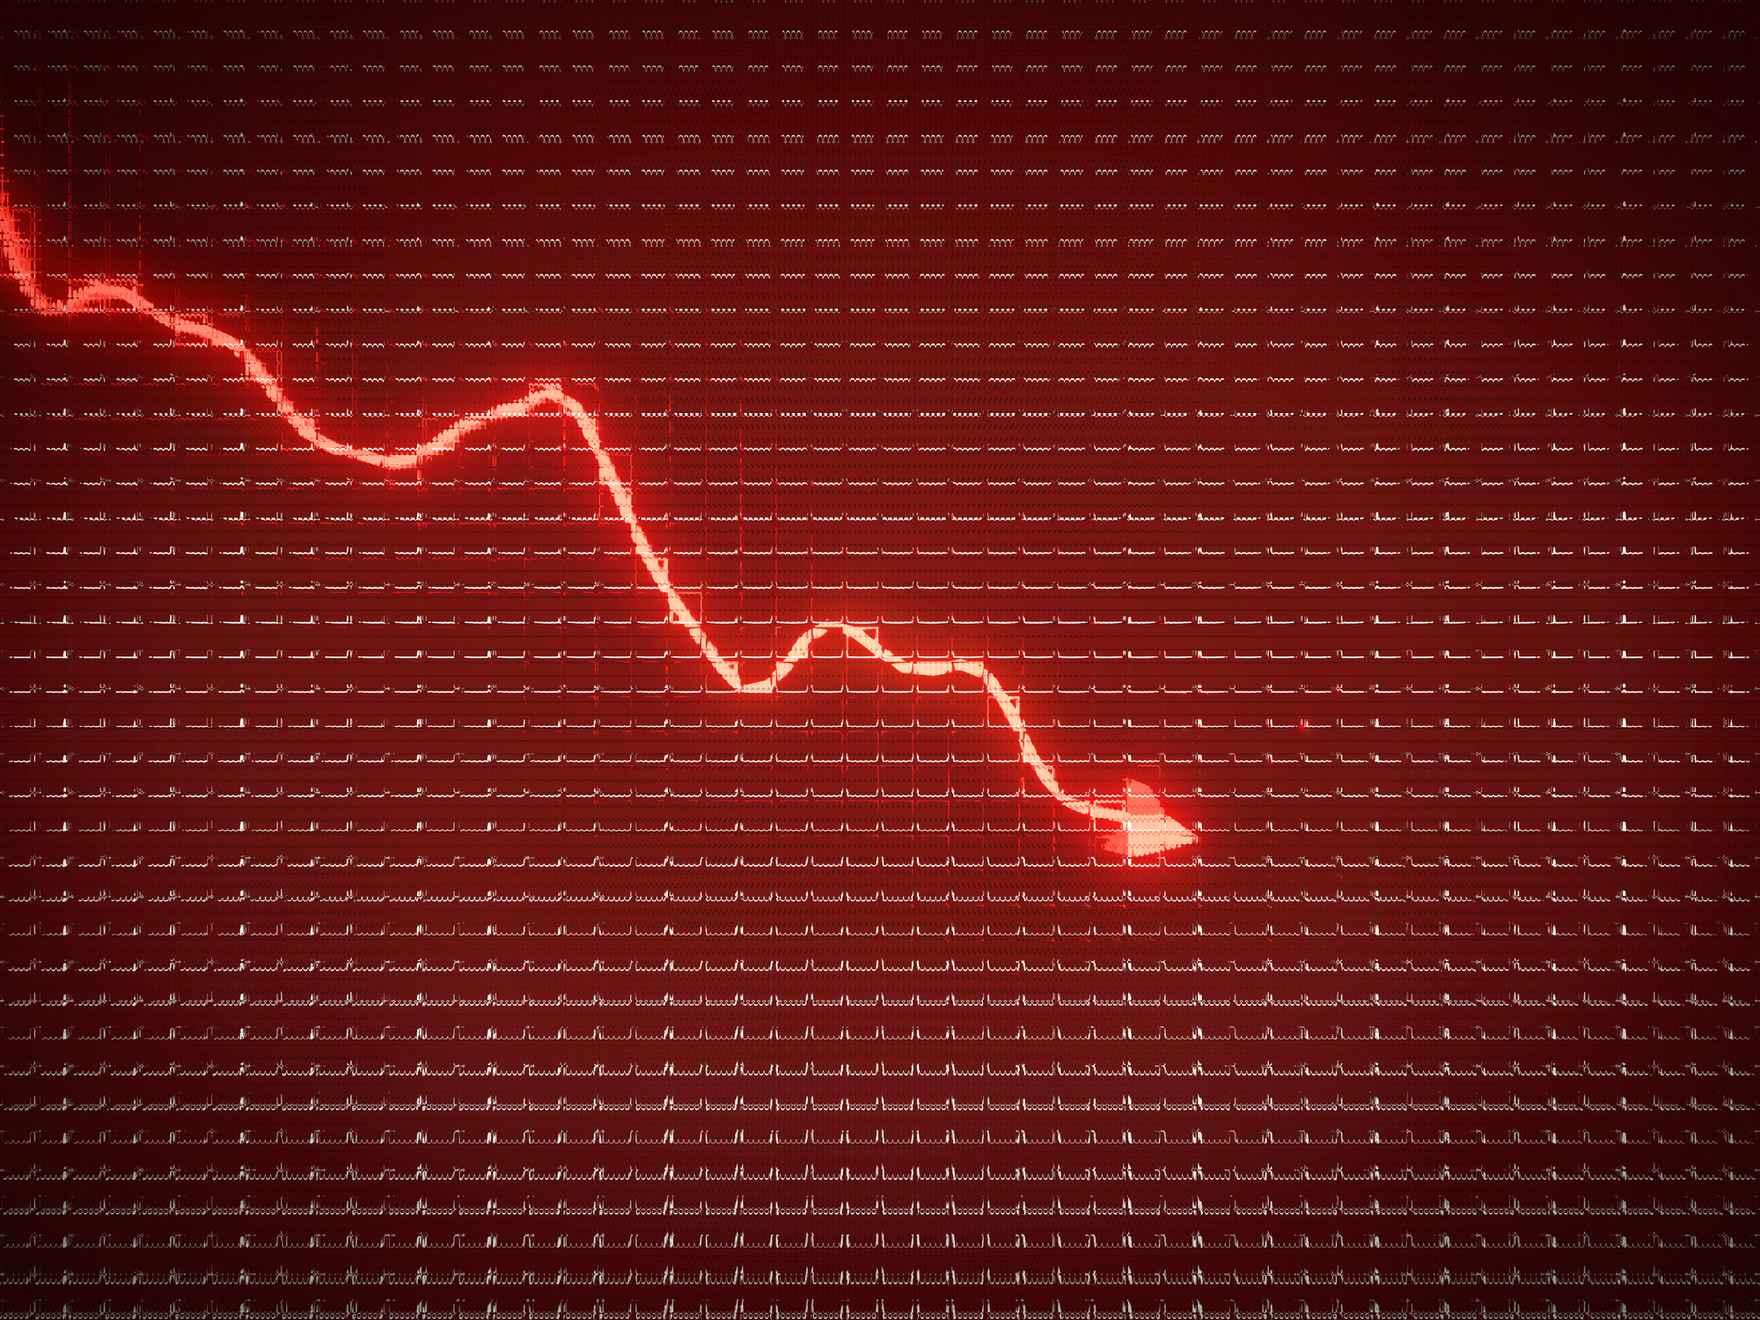 market_downturn.jpg